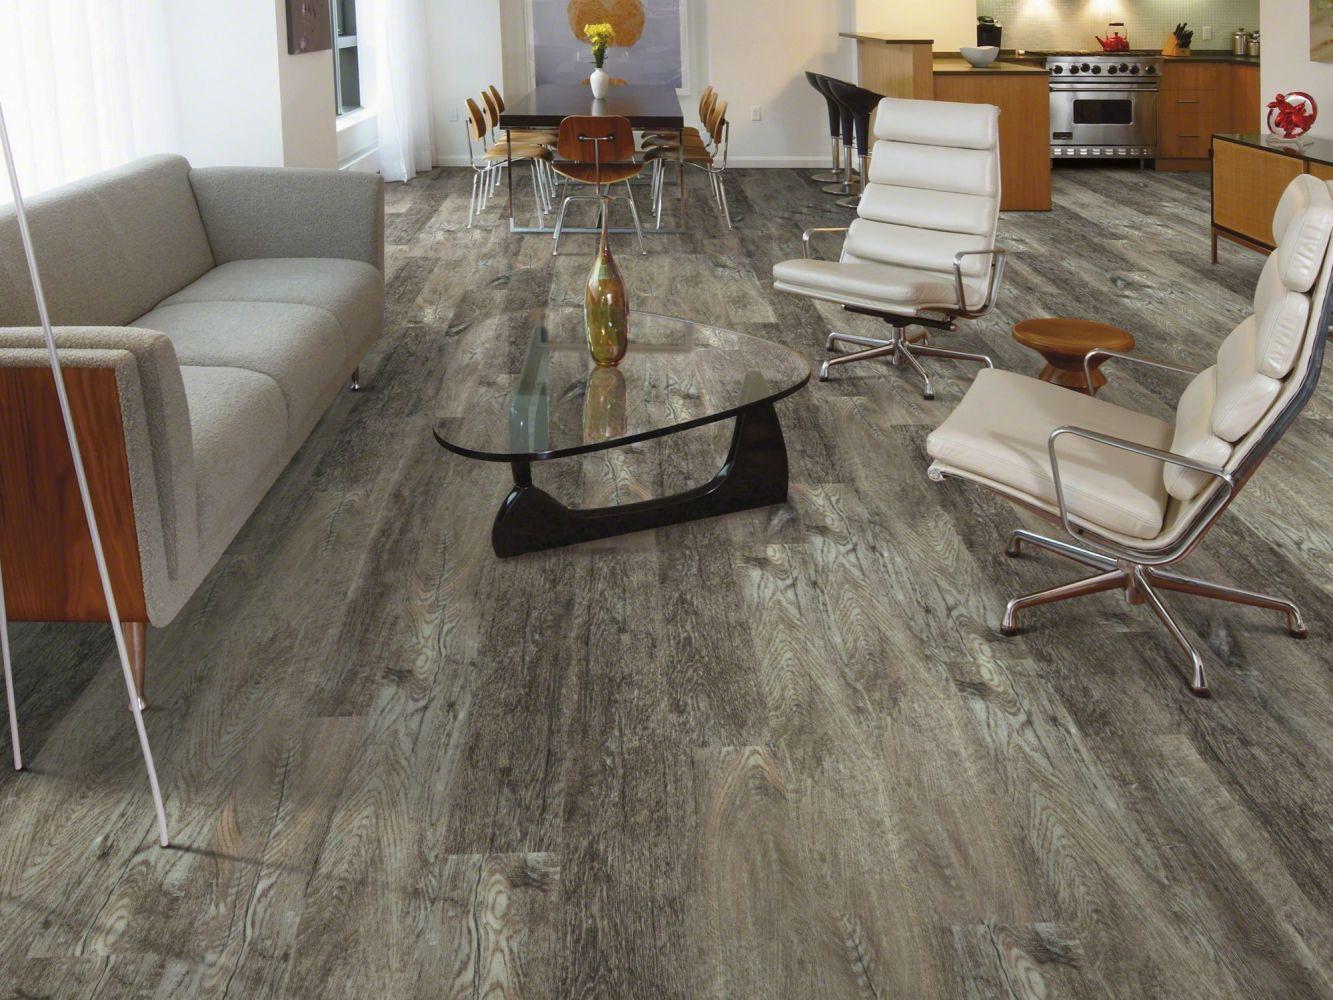 Shaw Floors Dr Horton Ballantyne Plus Click Smoky Oak 00556_DR036